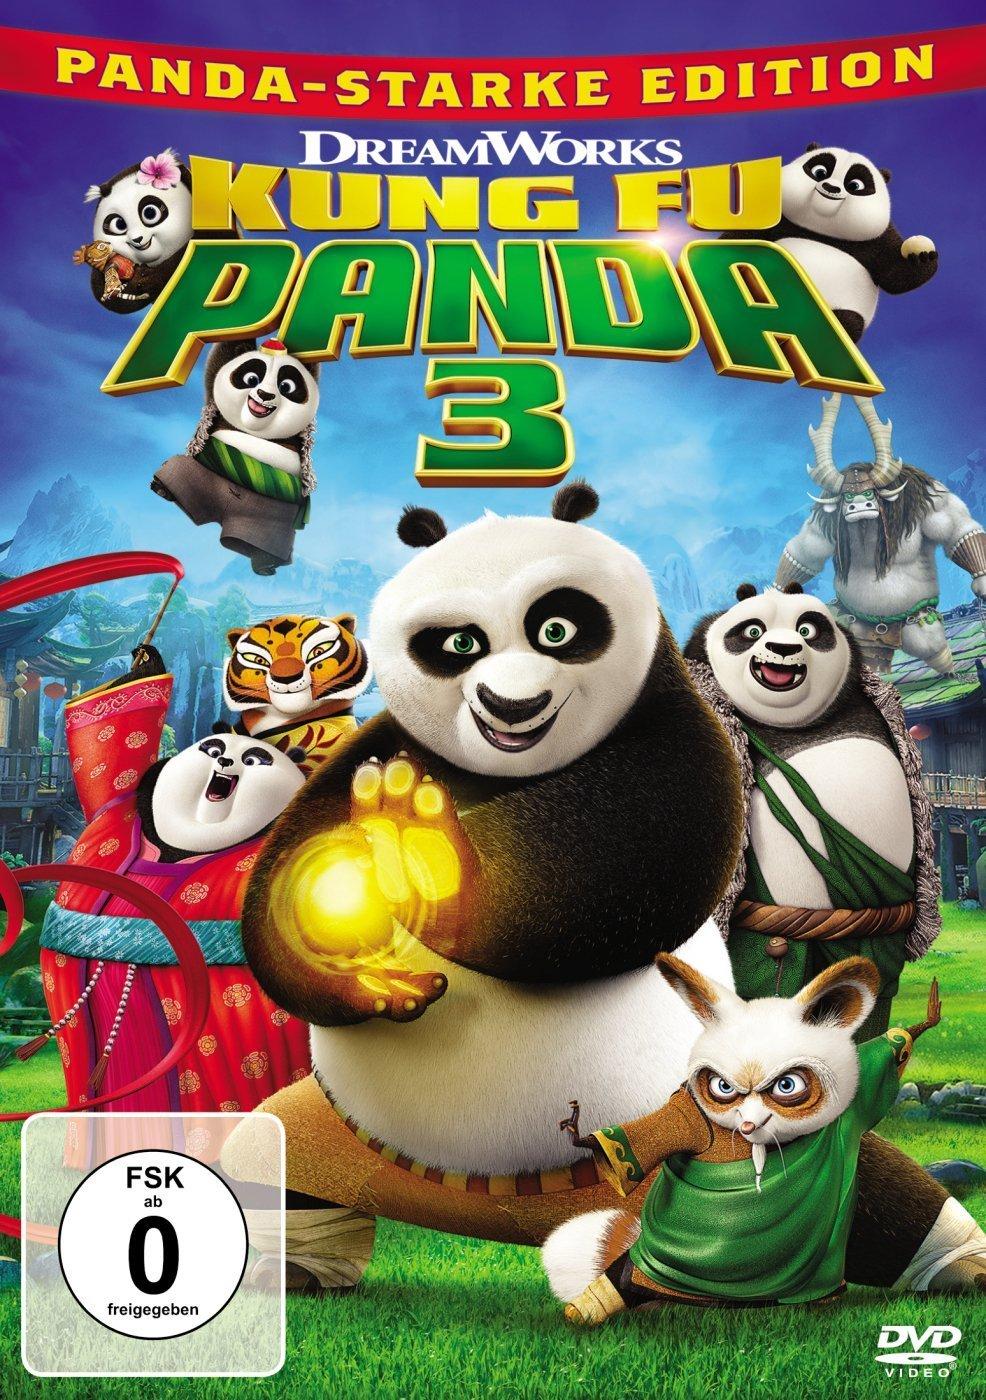 DVD-Cover von Kung Fu Panda 3